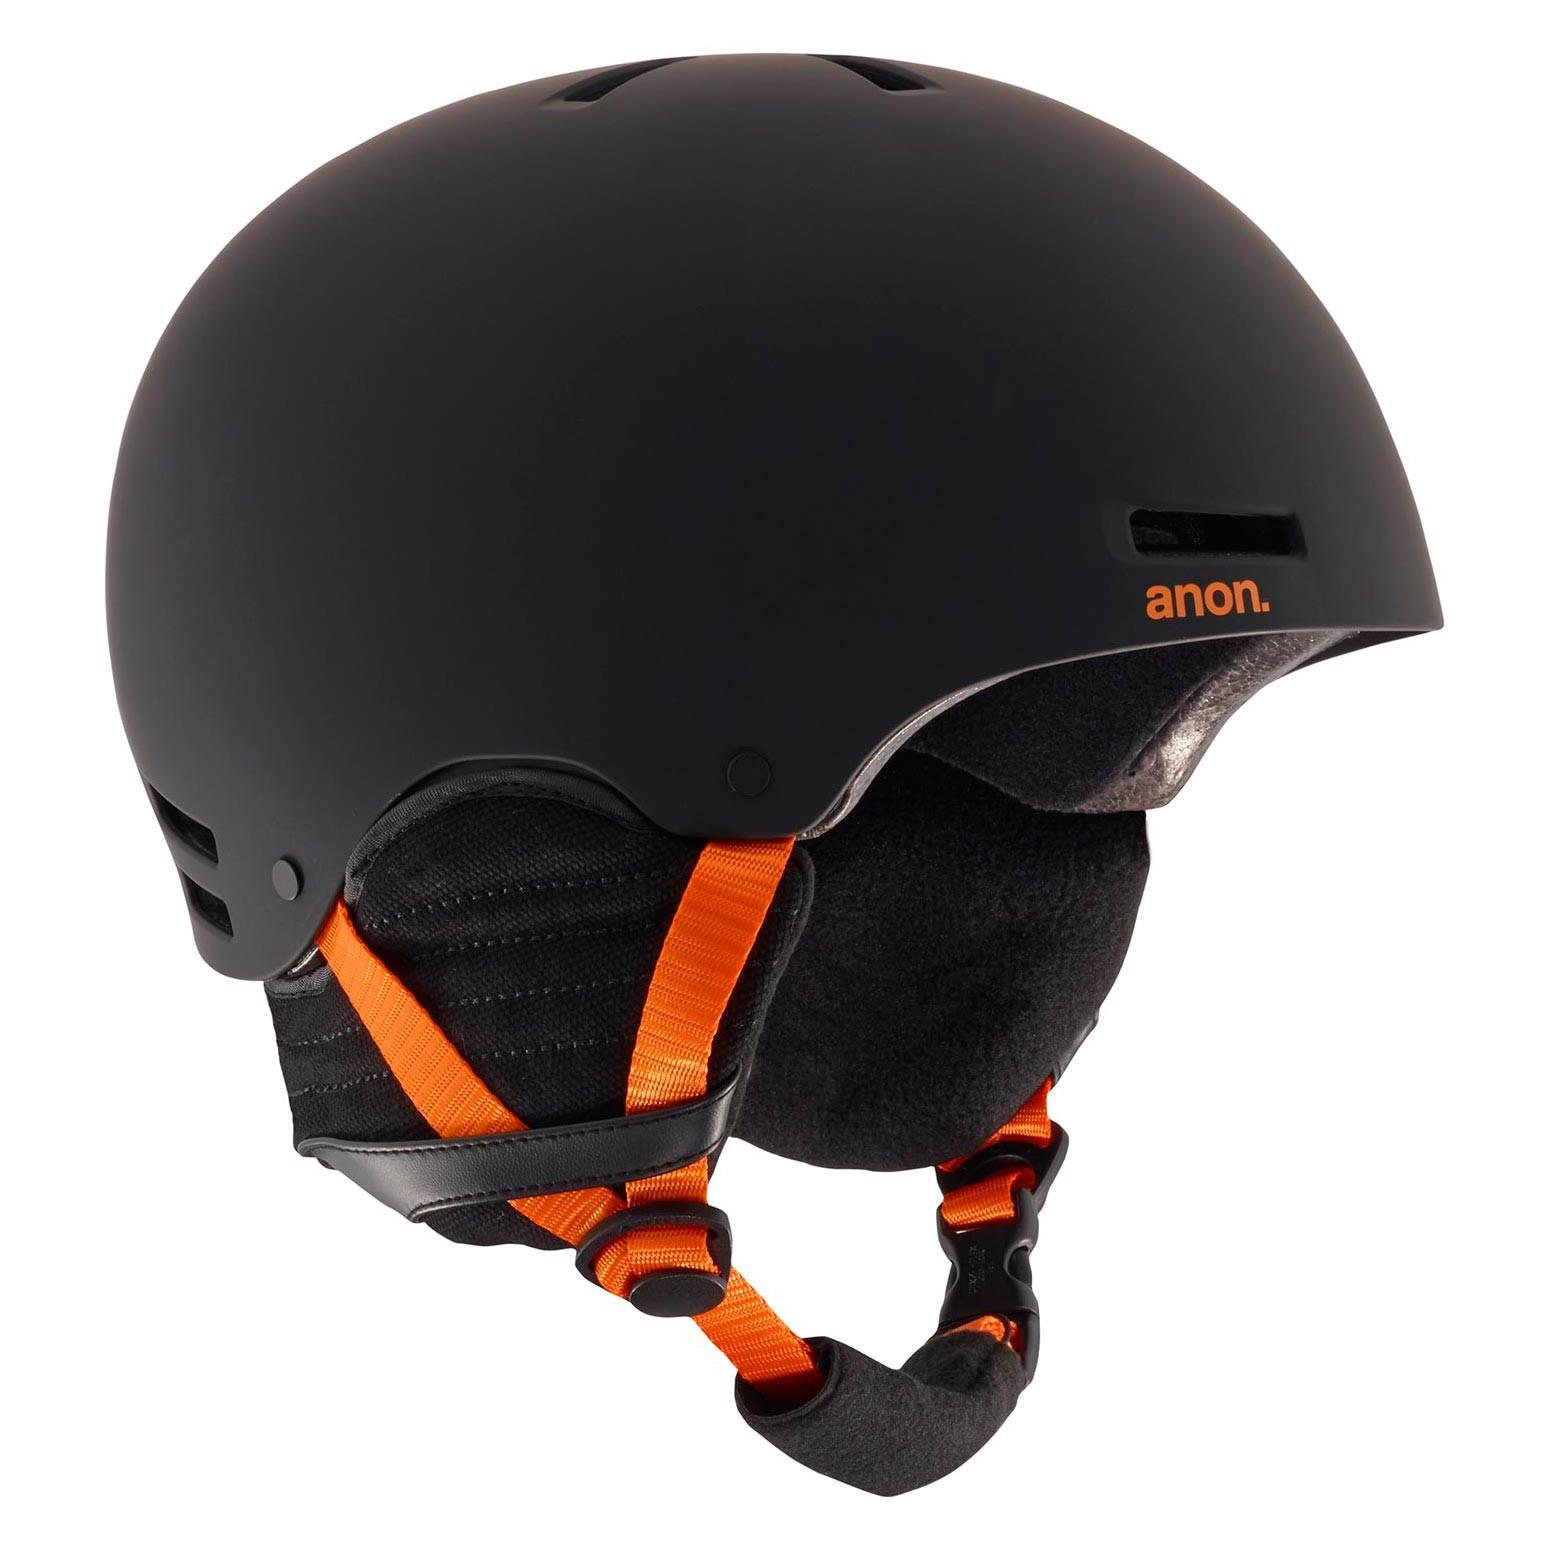 Helma Anon Raider black/orange vel.S 16/17 + doručení do 24 hodin